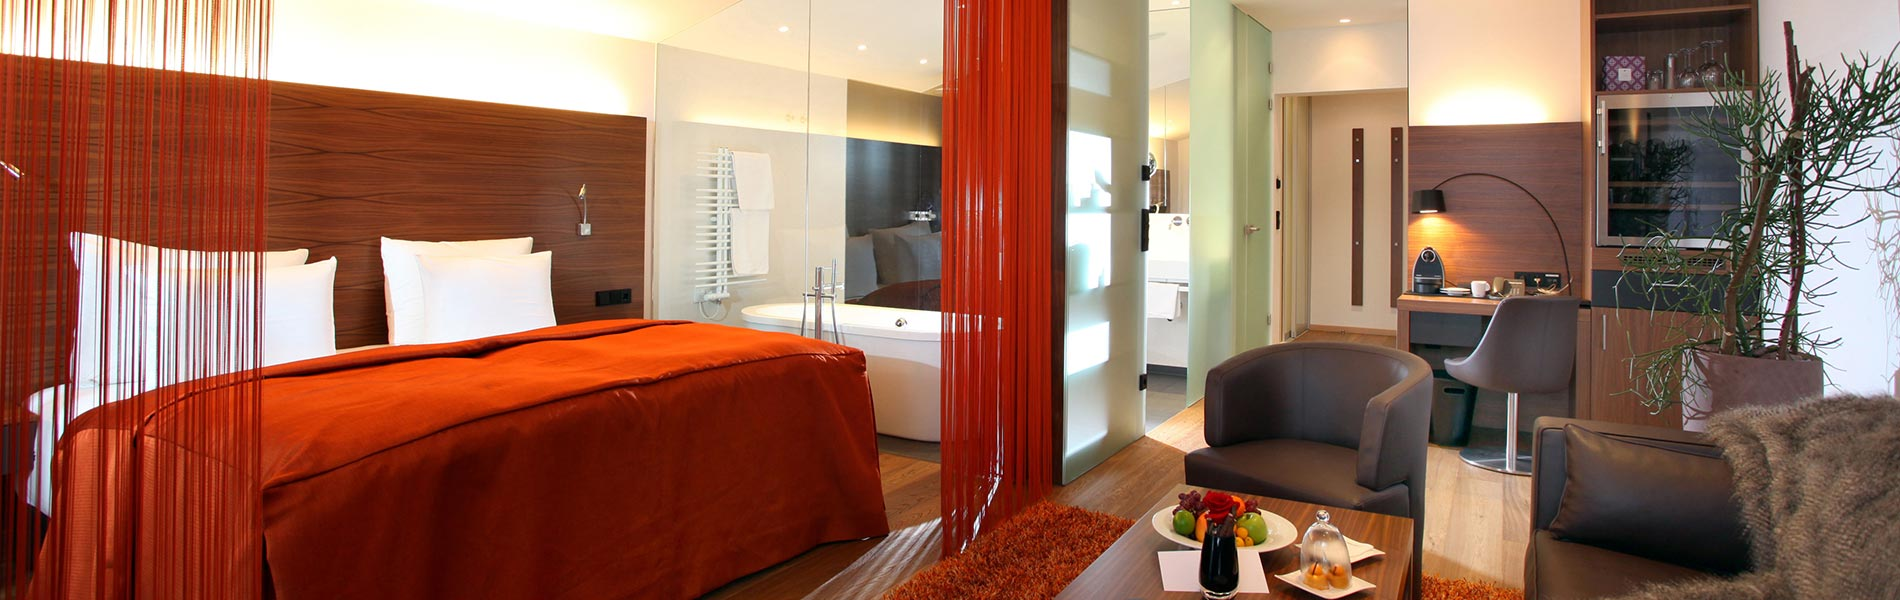 Pauschalen und Angebote Hotel Rosengarten 5 Sterne Hotel Relais & Châteaux Hotel Kirchberg Tirol Austria